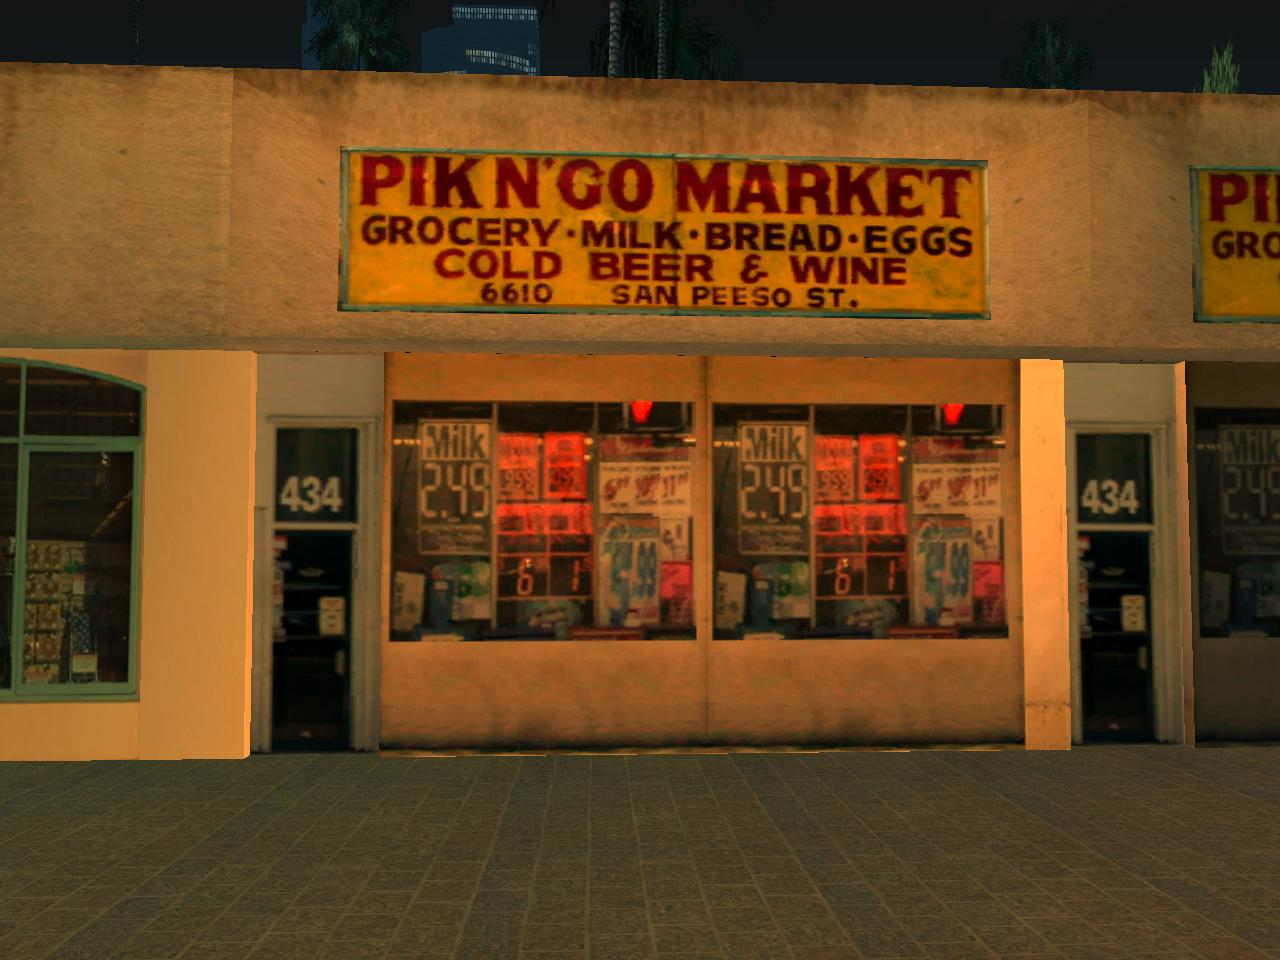 Pik N' Go Market